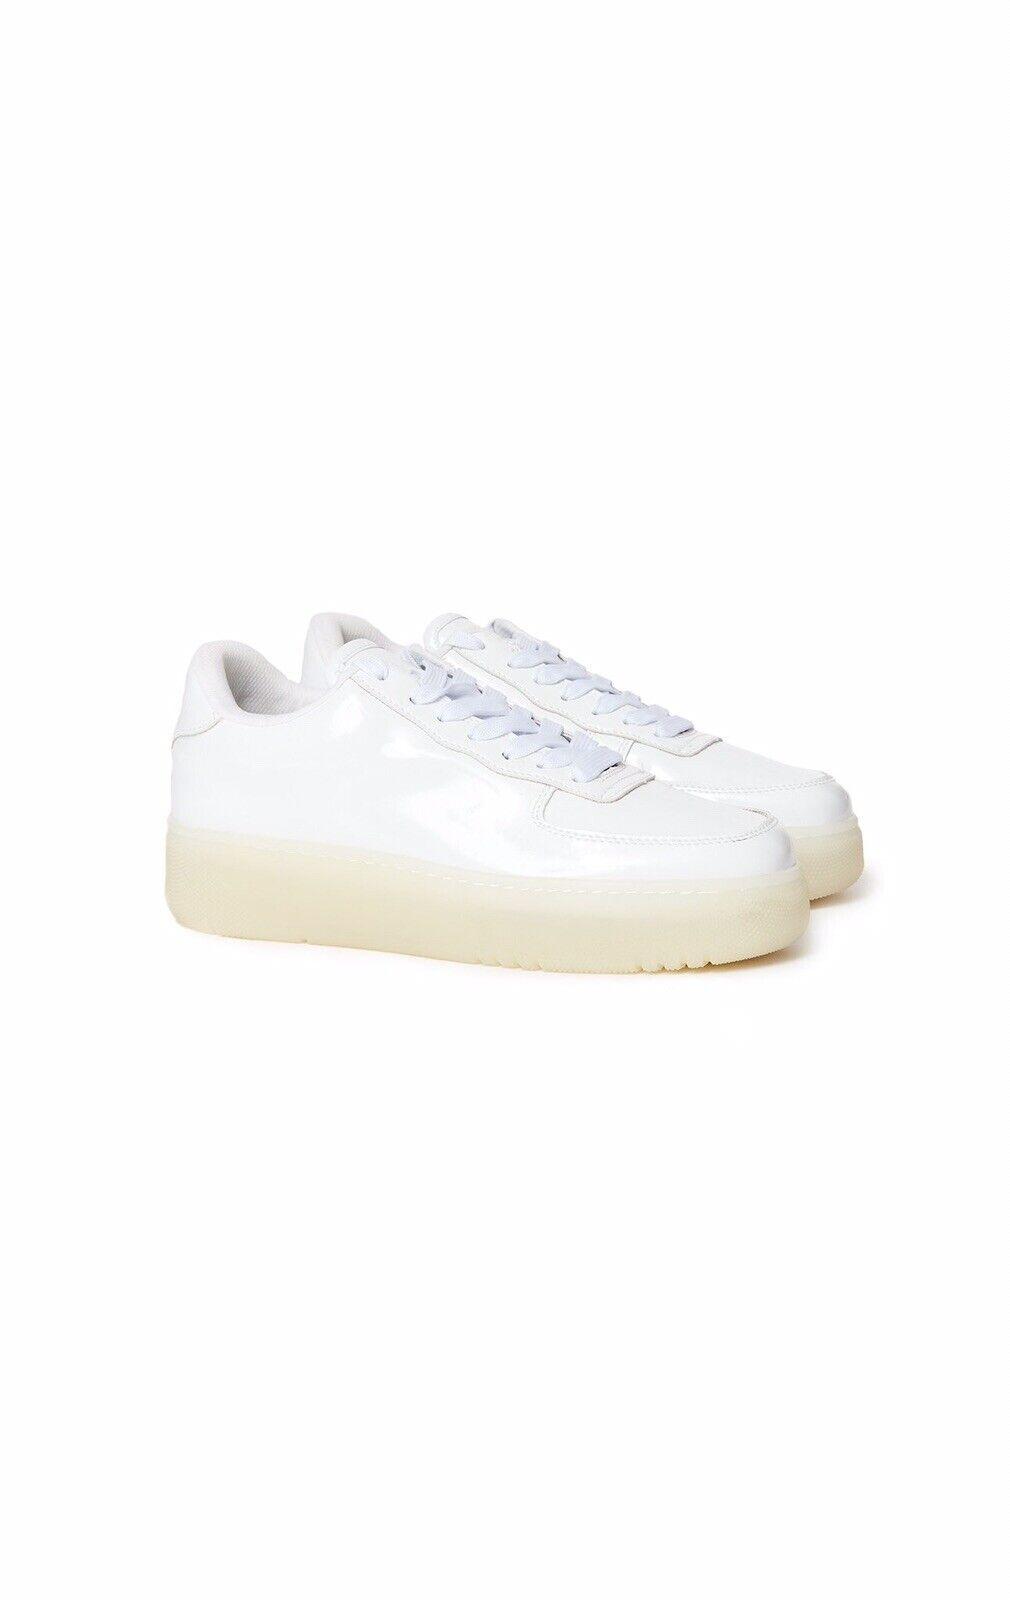 Jeffrey Campbell low top pure white court platform sneakers sz 8.5